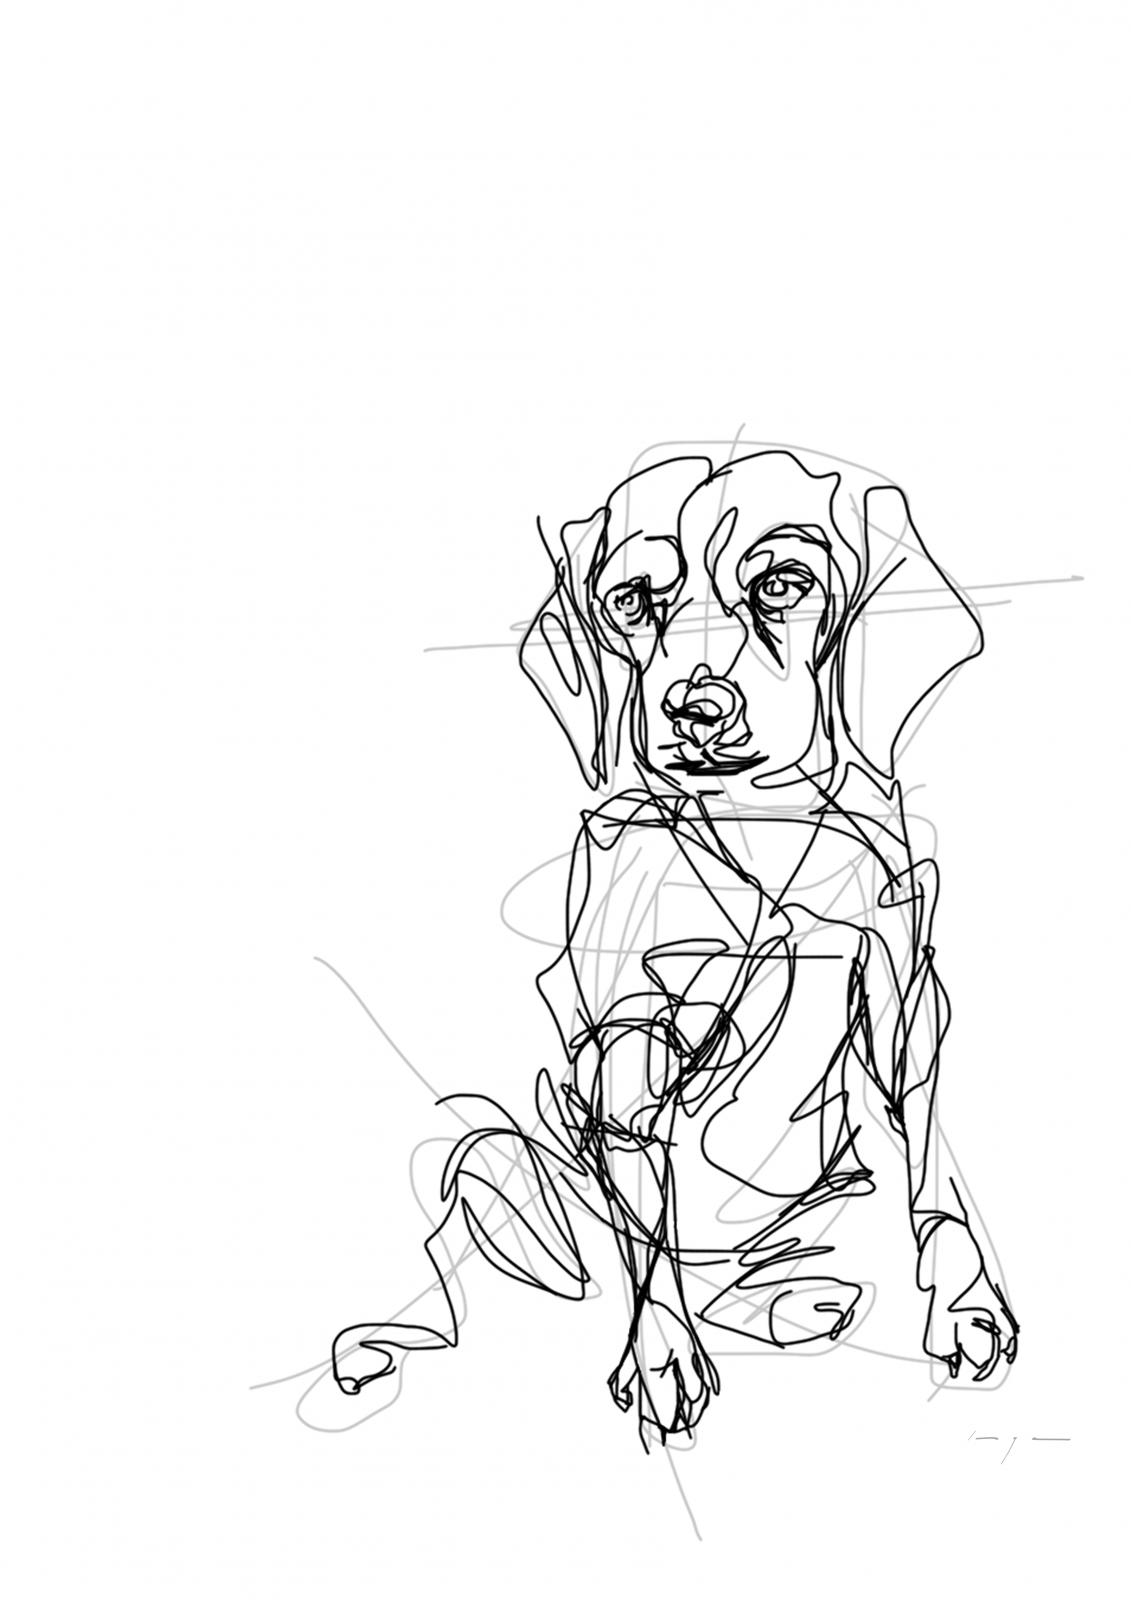 Dog | Digital Drawing